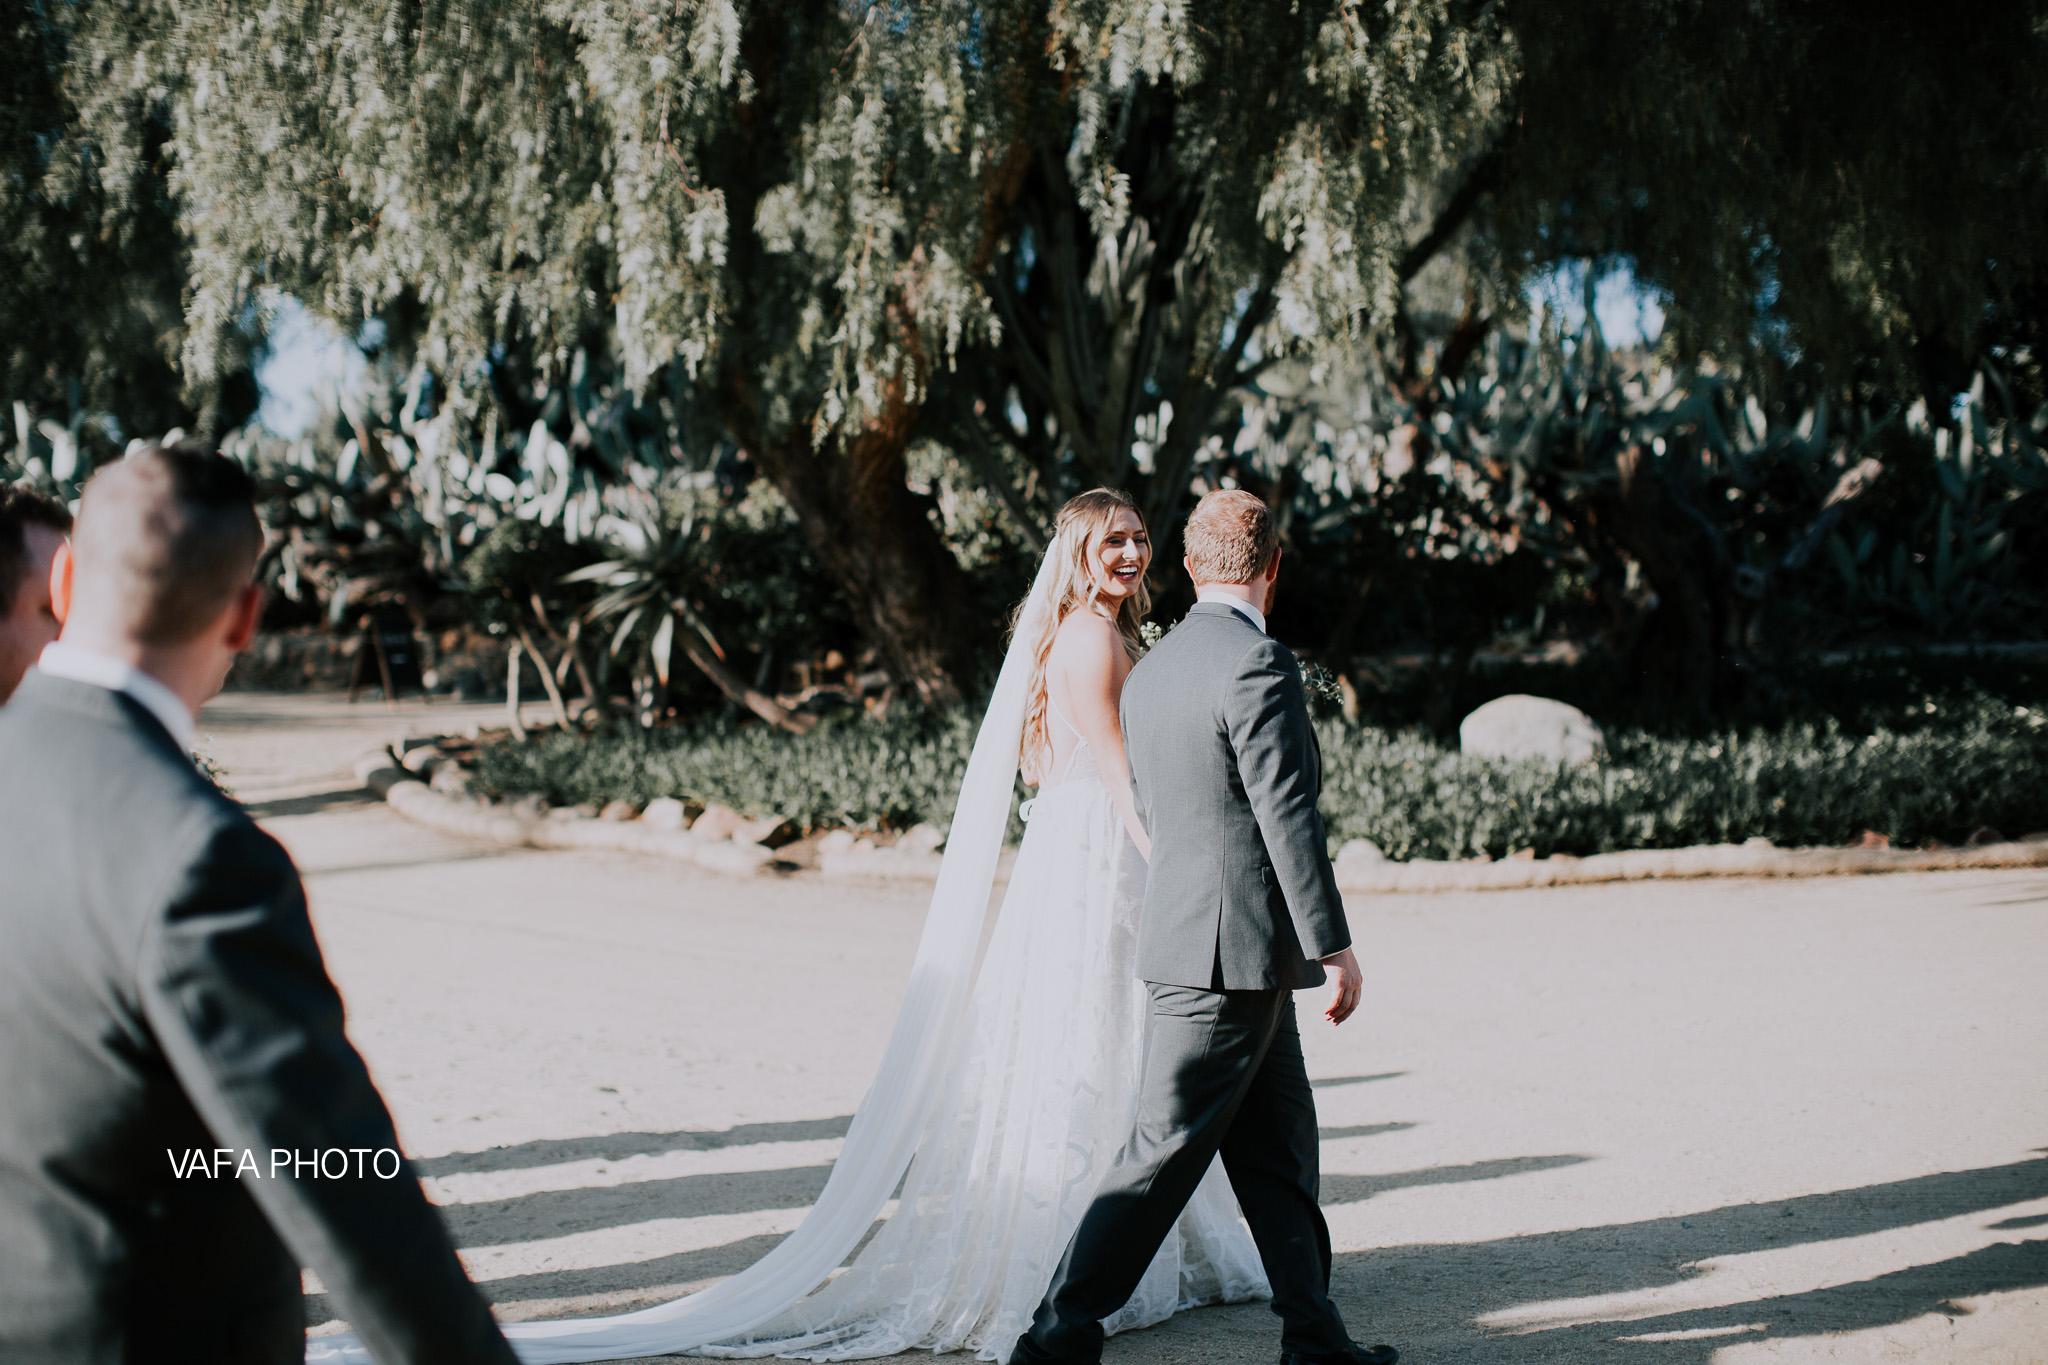 Leo-Carrillo-Ranch-Wedding-Lauren-Mike-Vafa-Photo-663.jpg